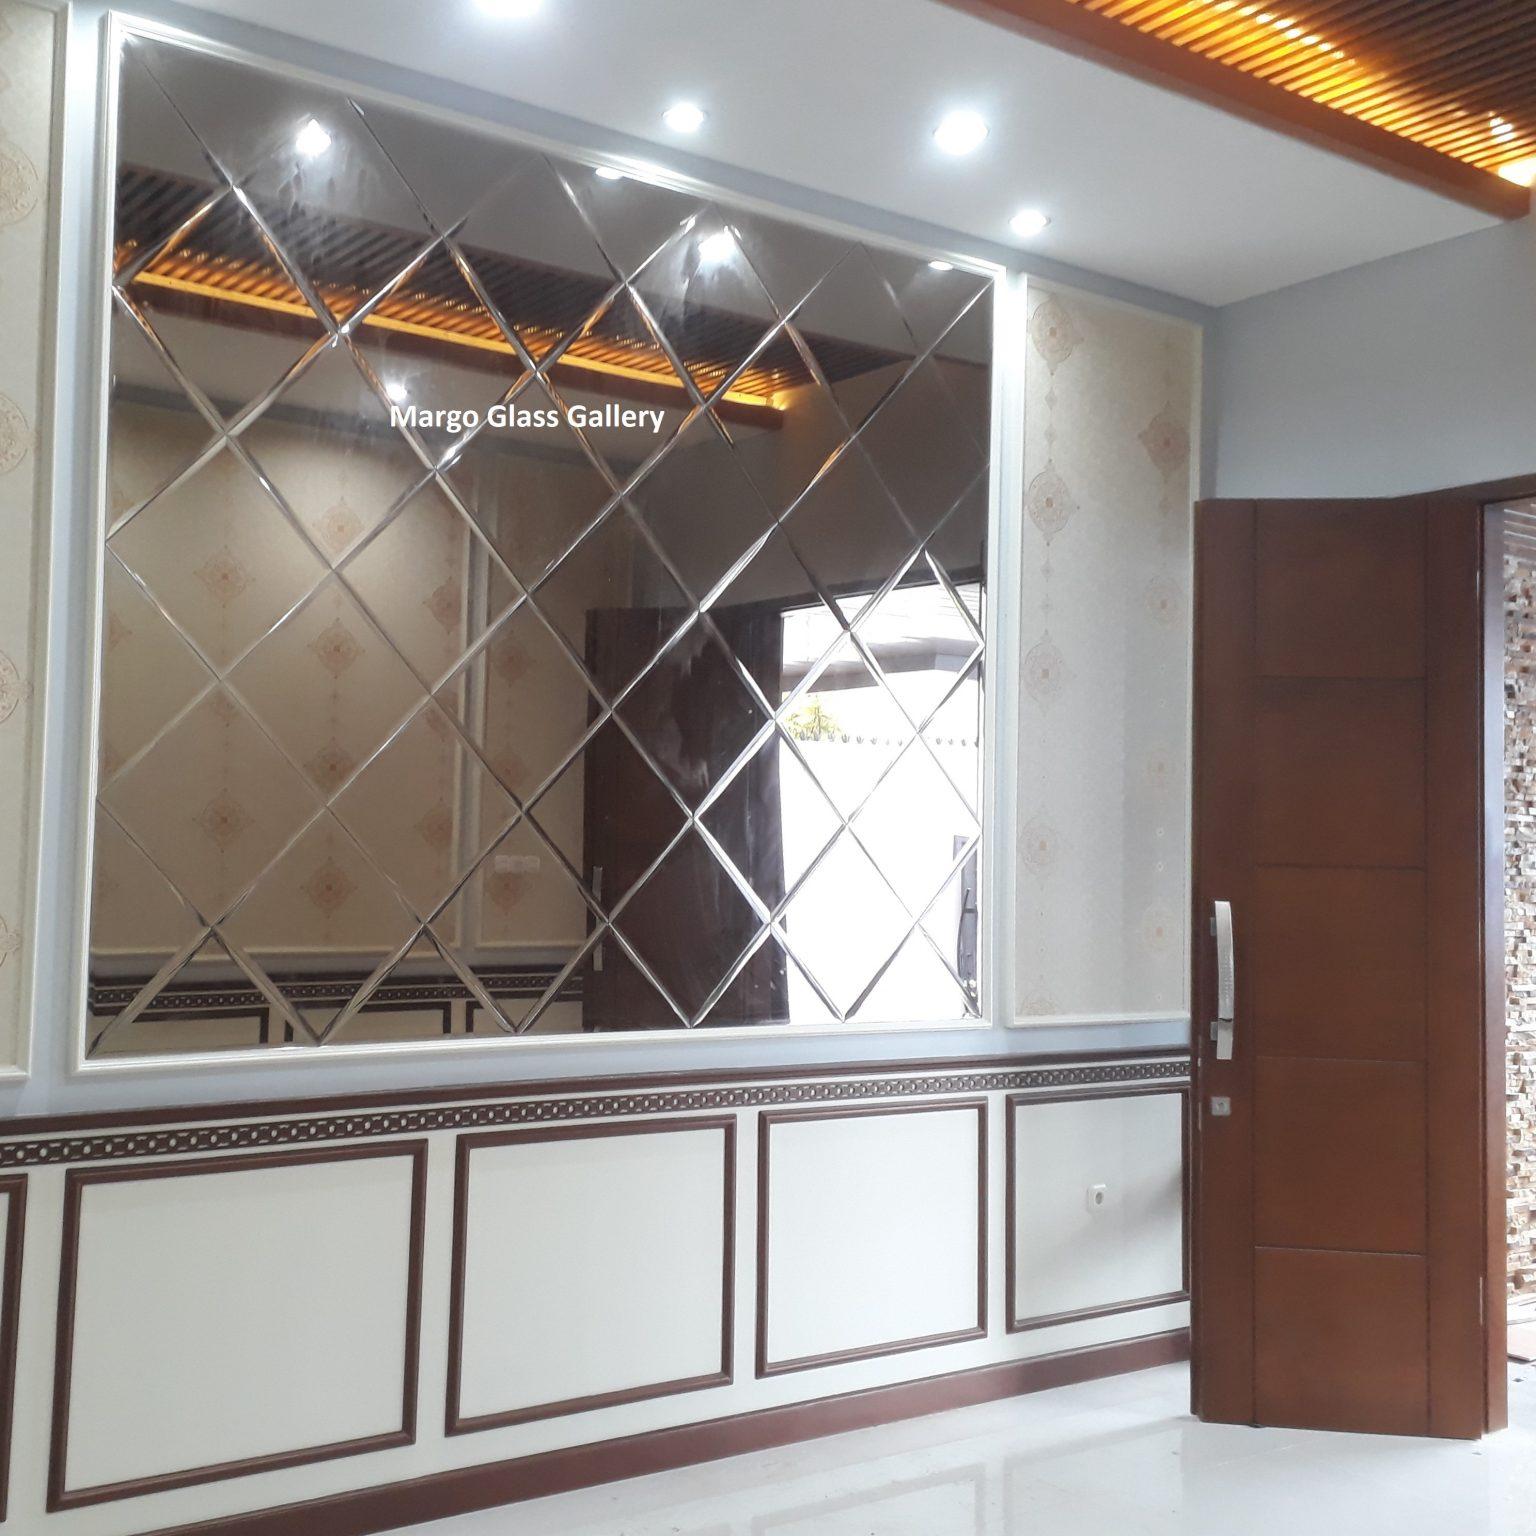 MG 065014 Cermin Dinding Bevel Brown Wajik